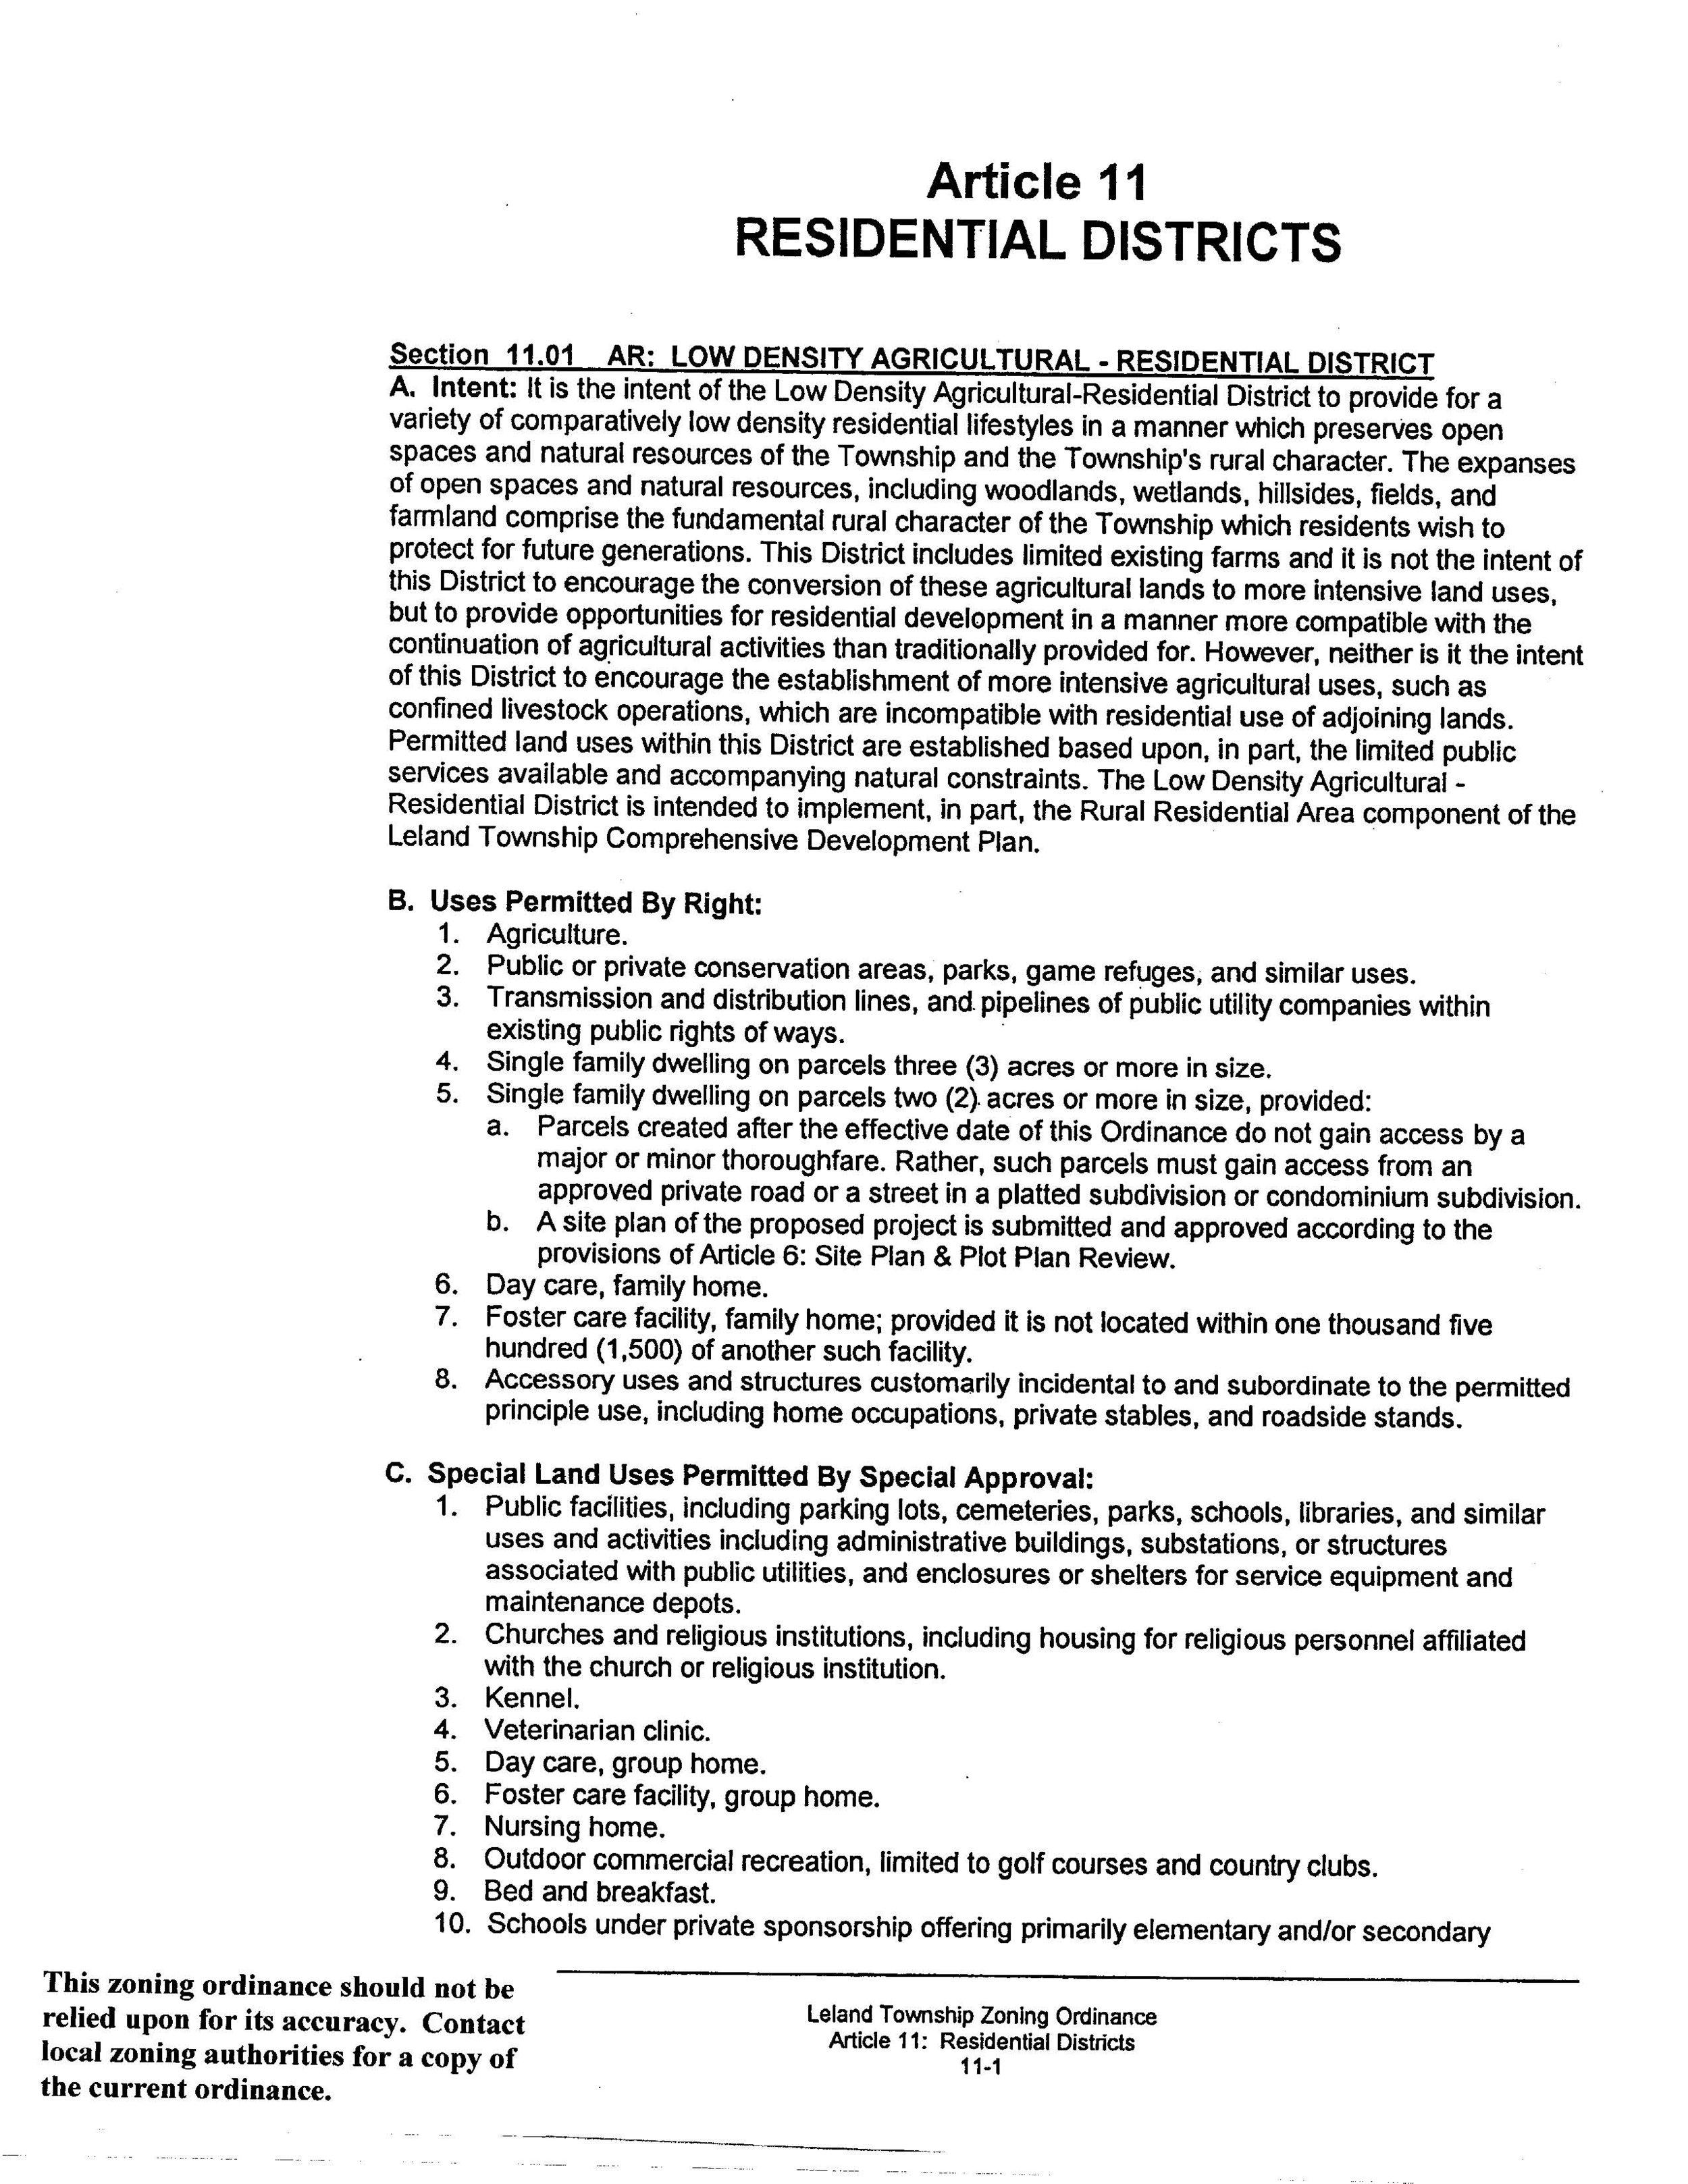 4388 N Manitou Trail, Leland - Marketing packet by Oltersdorf Realty LLC (37).jpg